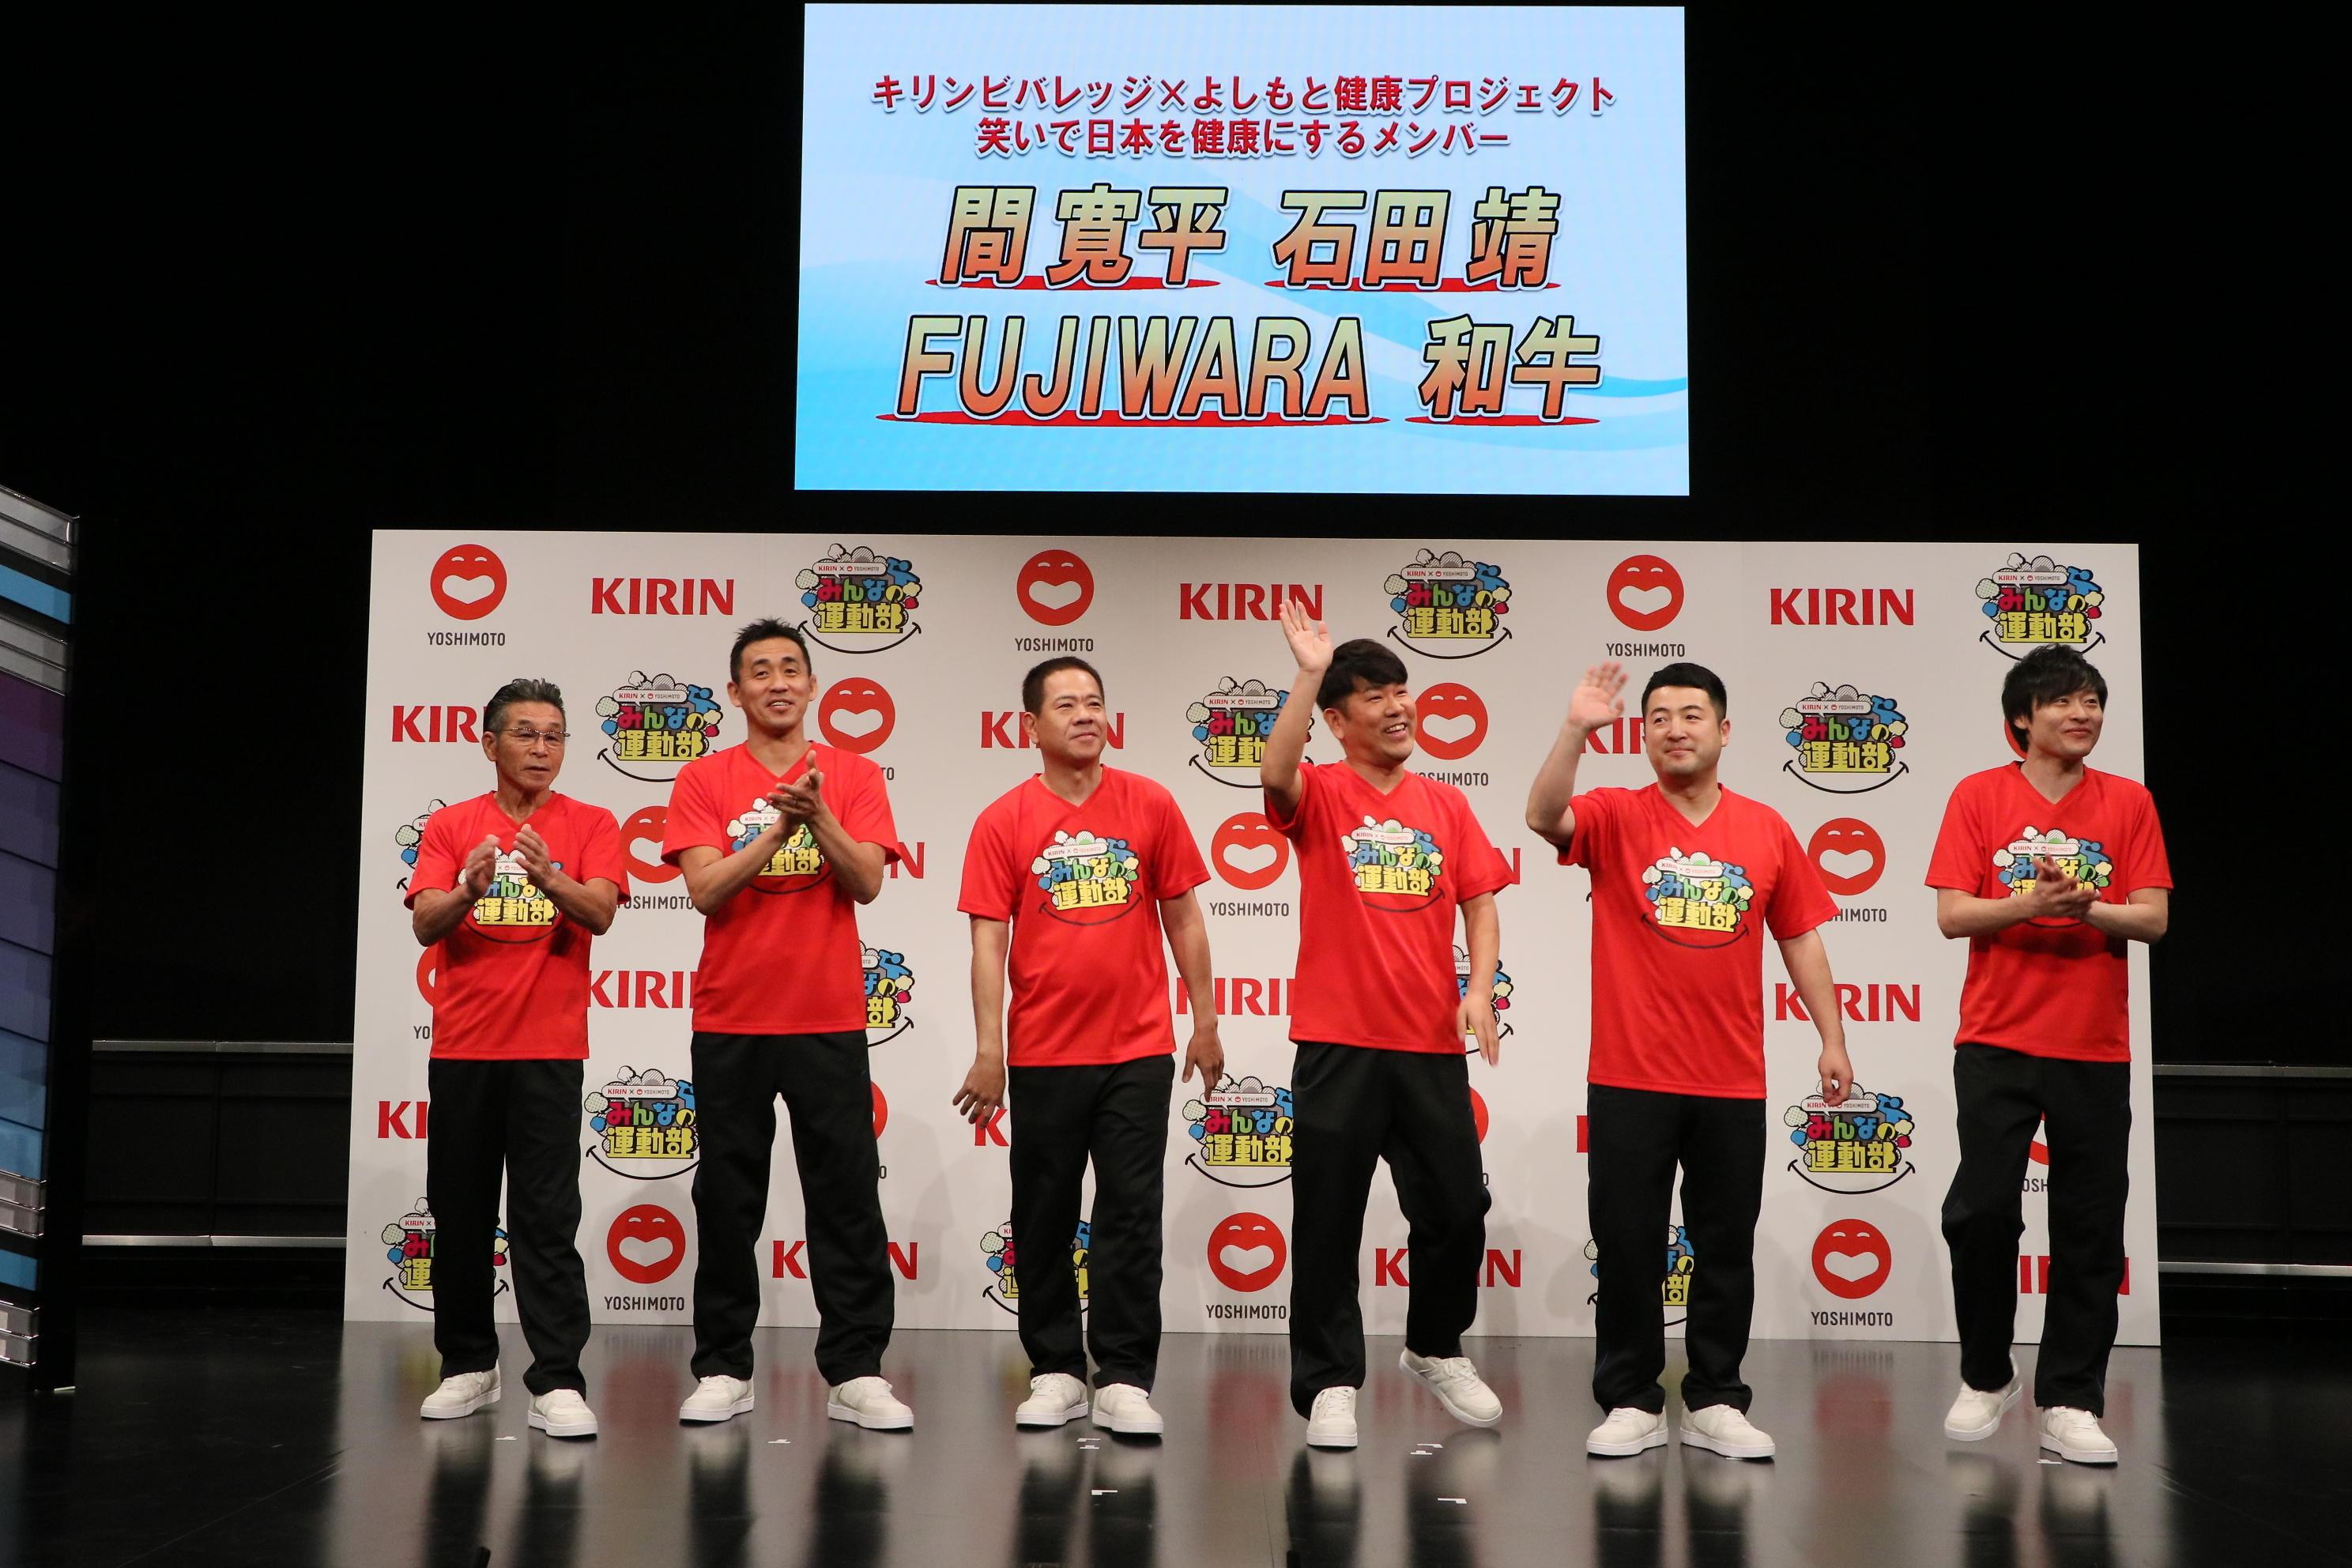 http://news.yoshimoto.co.jp/20190131141218-36bef560068e1bde3e5b2dfb6e15e0bff8c160a0.jpg